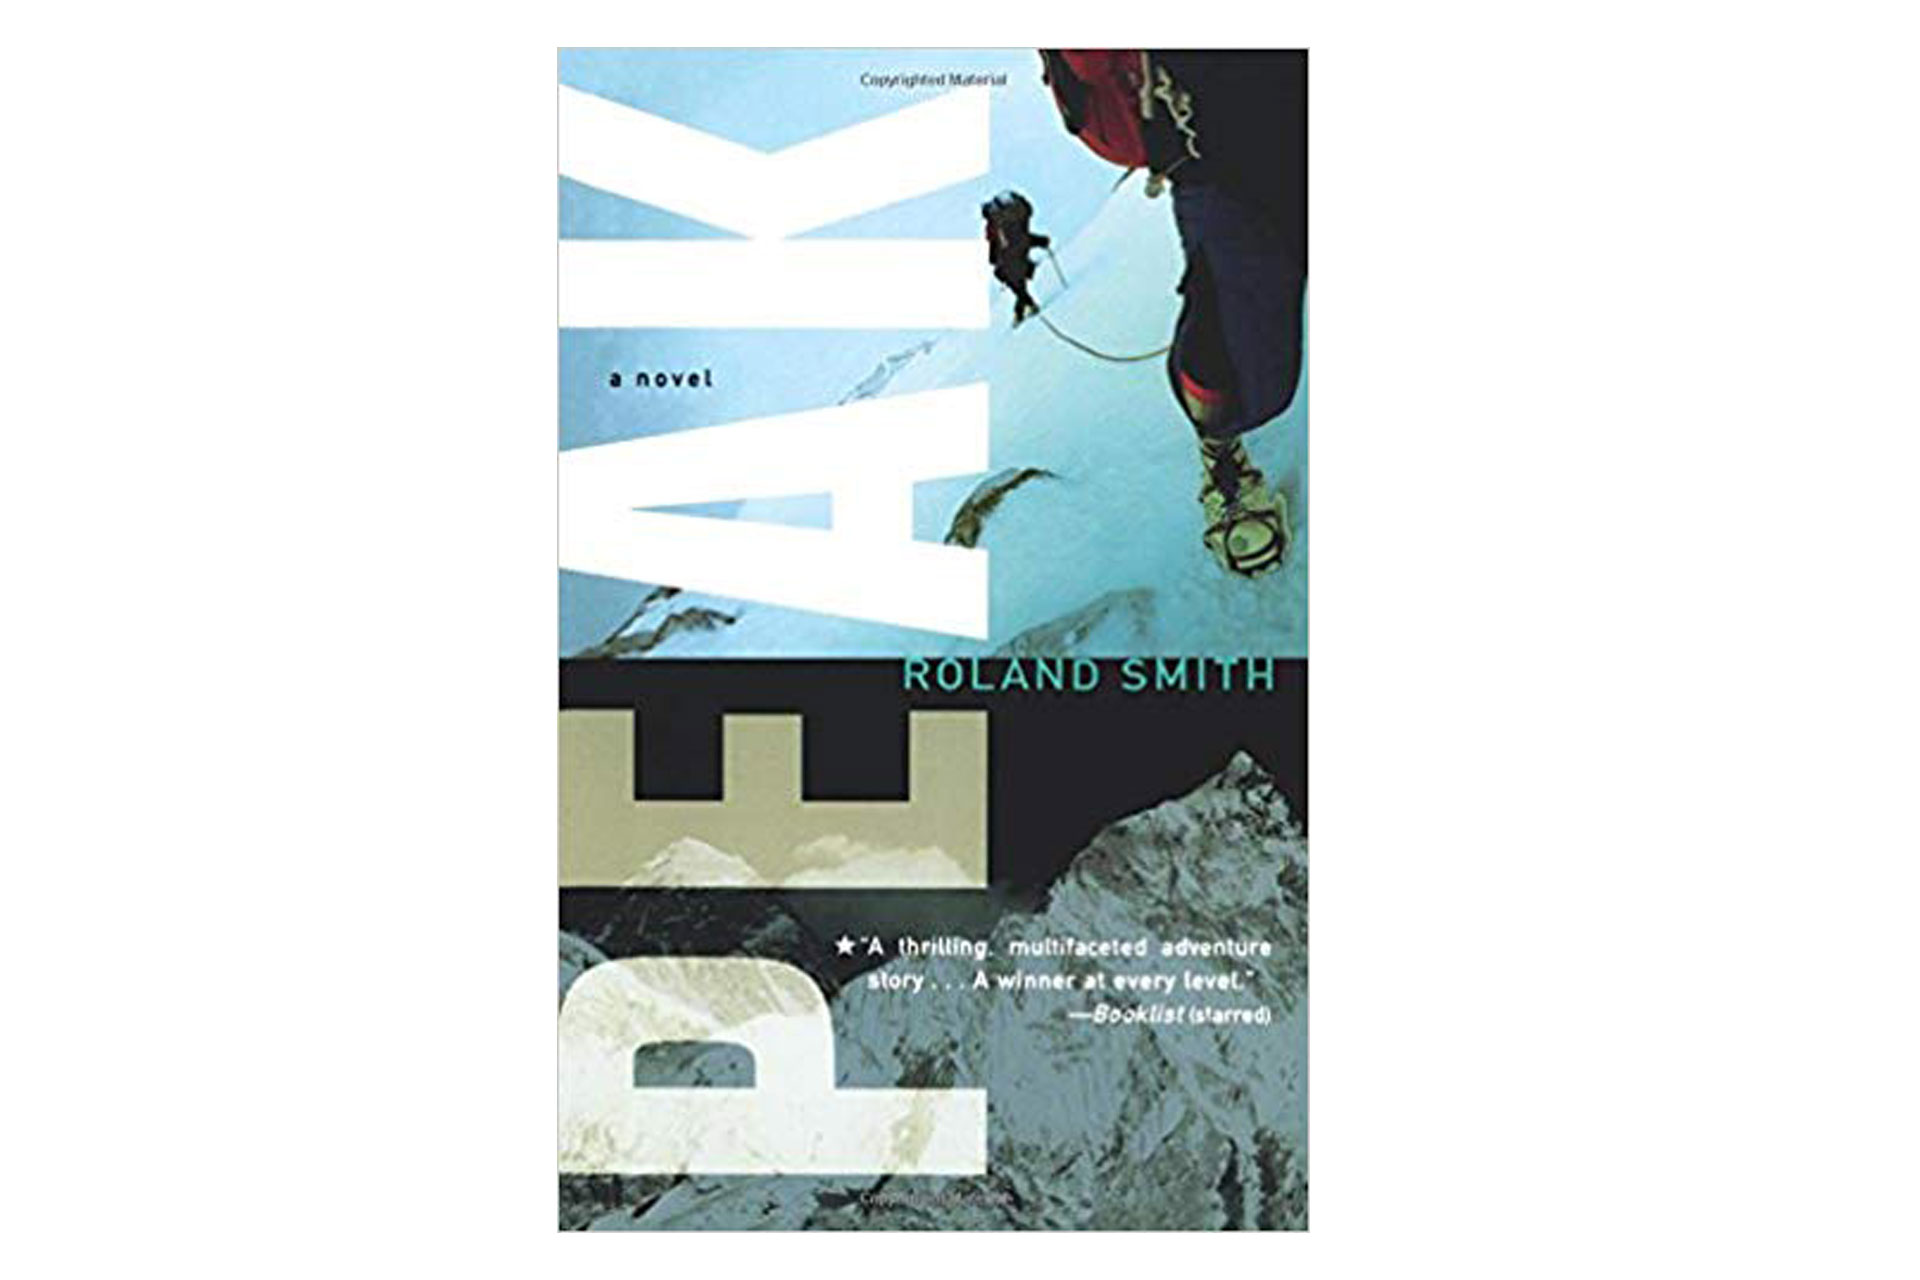 Peak Book; Courtesy of Amazon